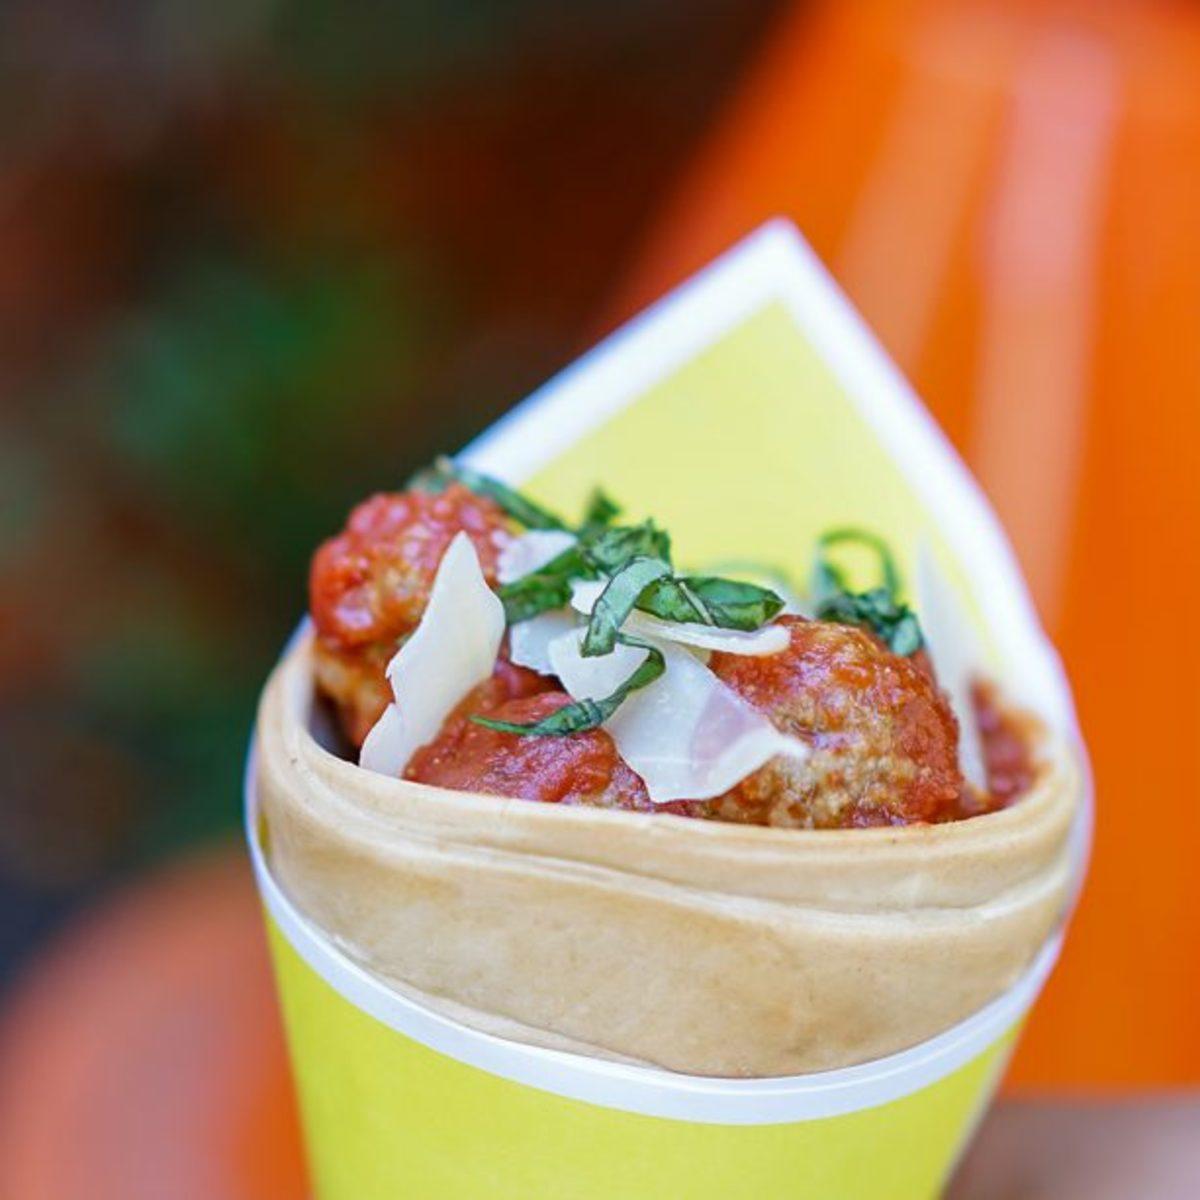 pixarfest-foods-habanero-meatball-cone